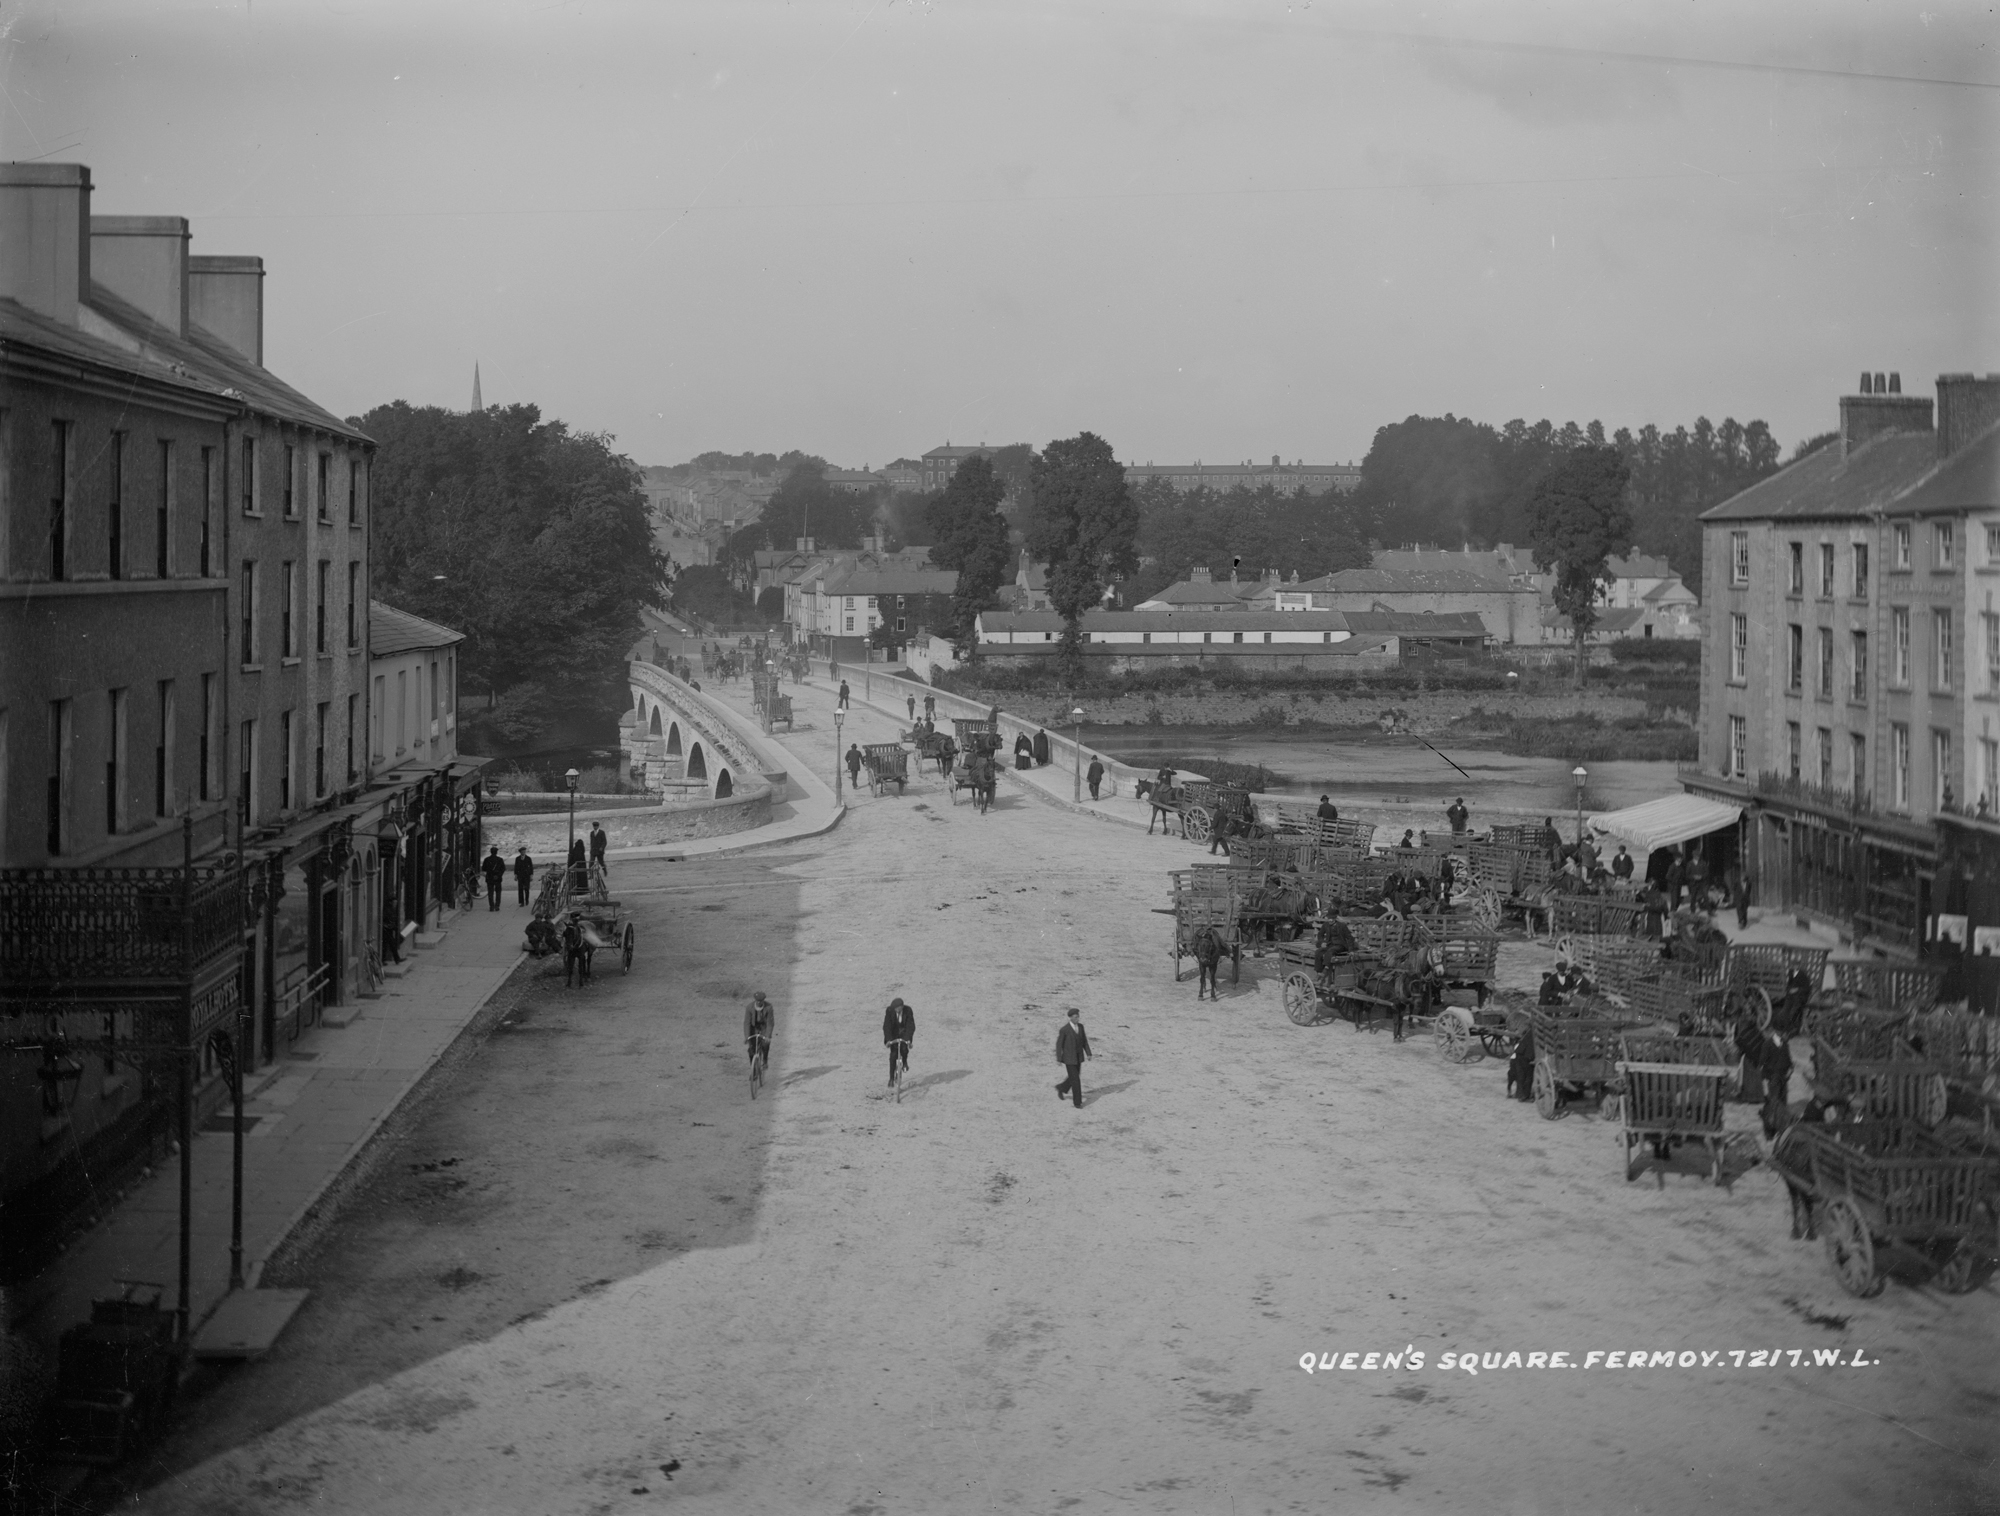 Queen's Square, Fermoy, Co. Cork